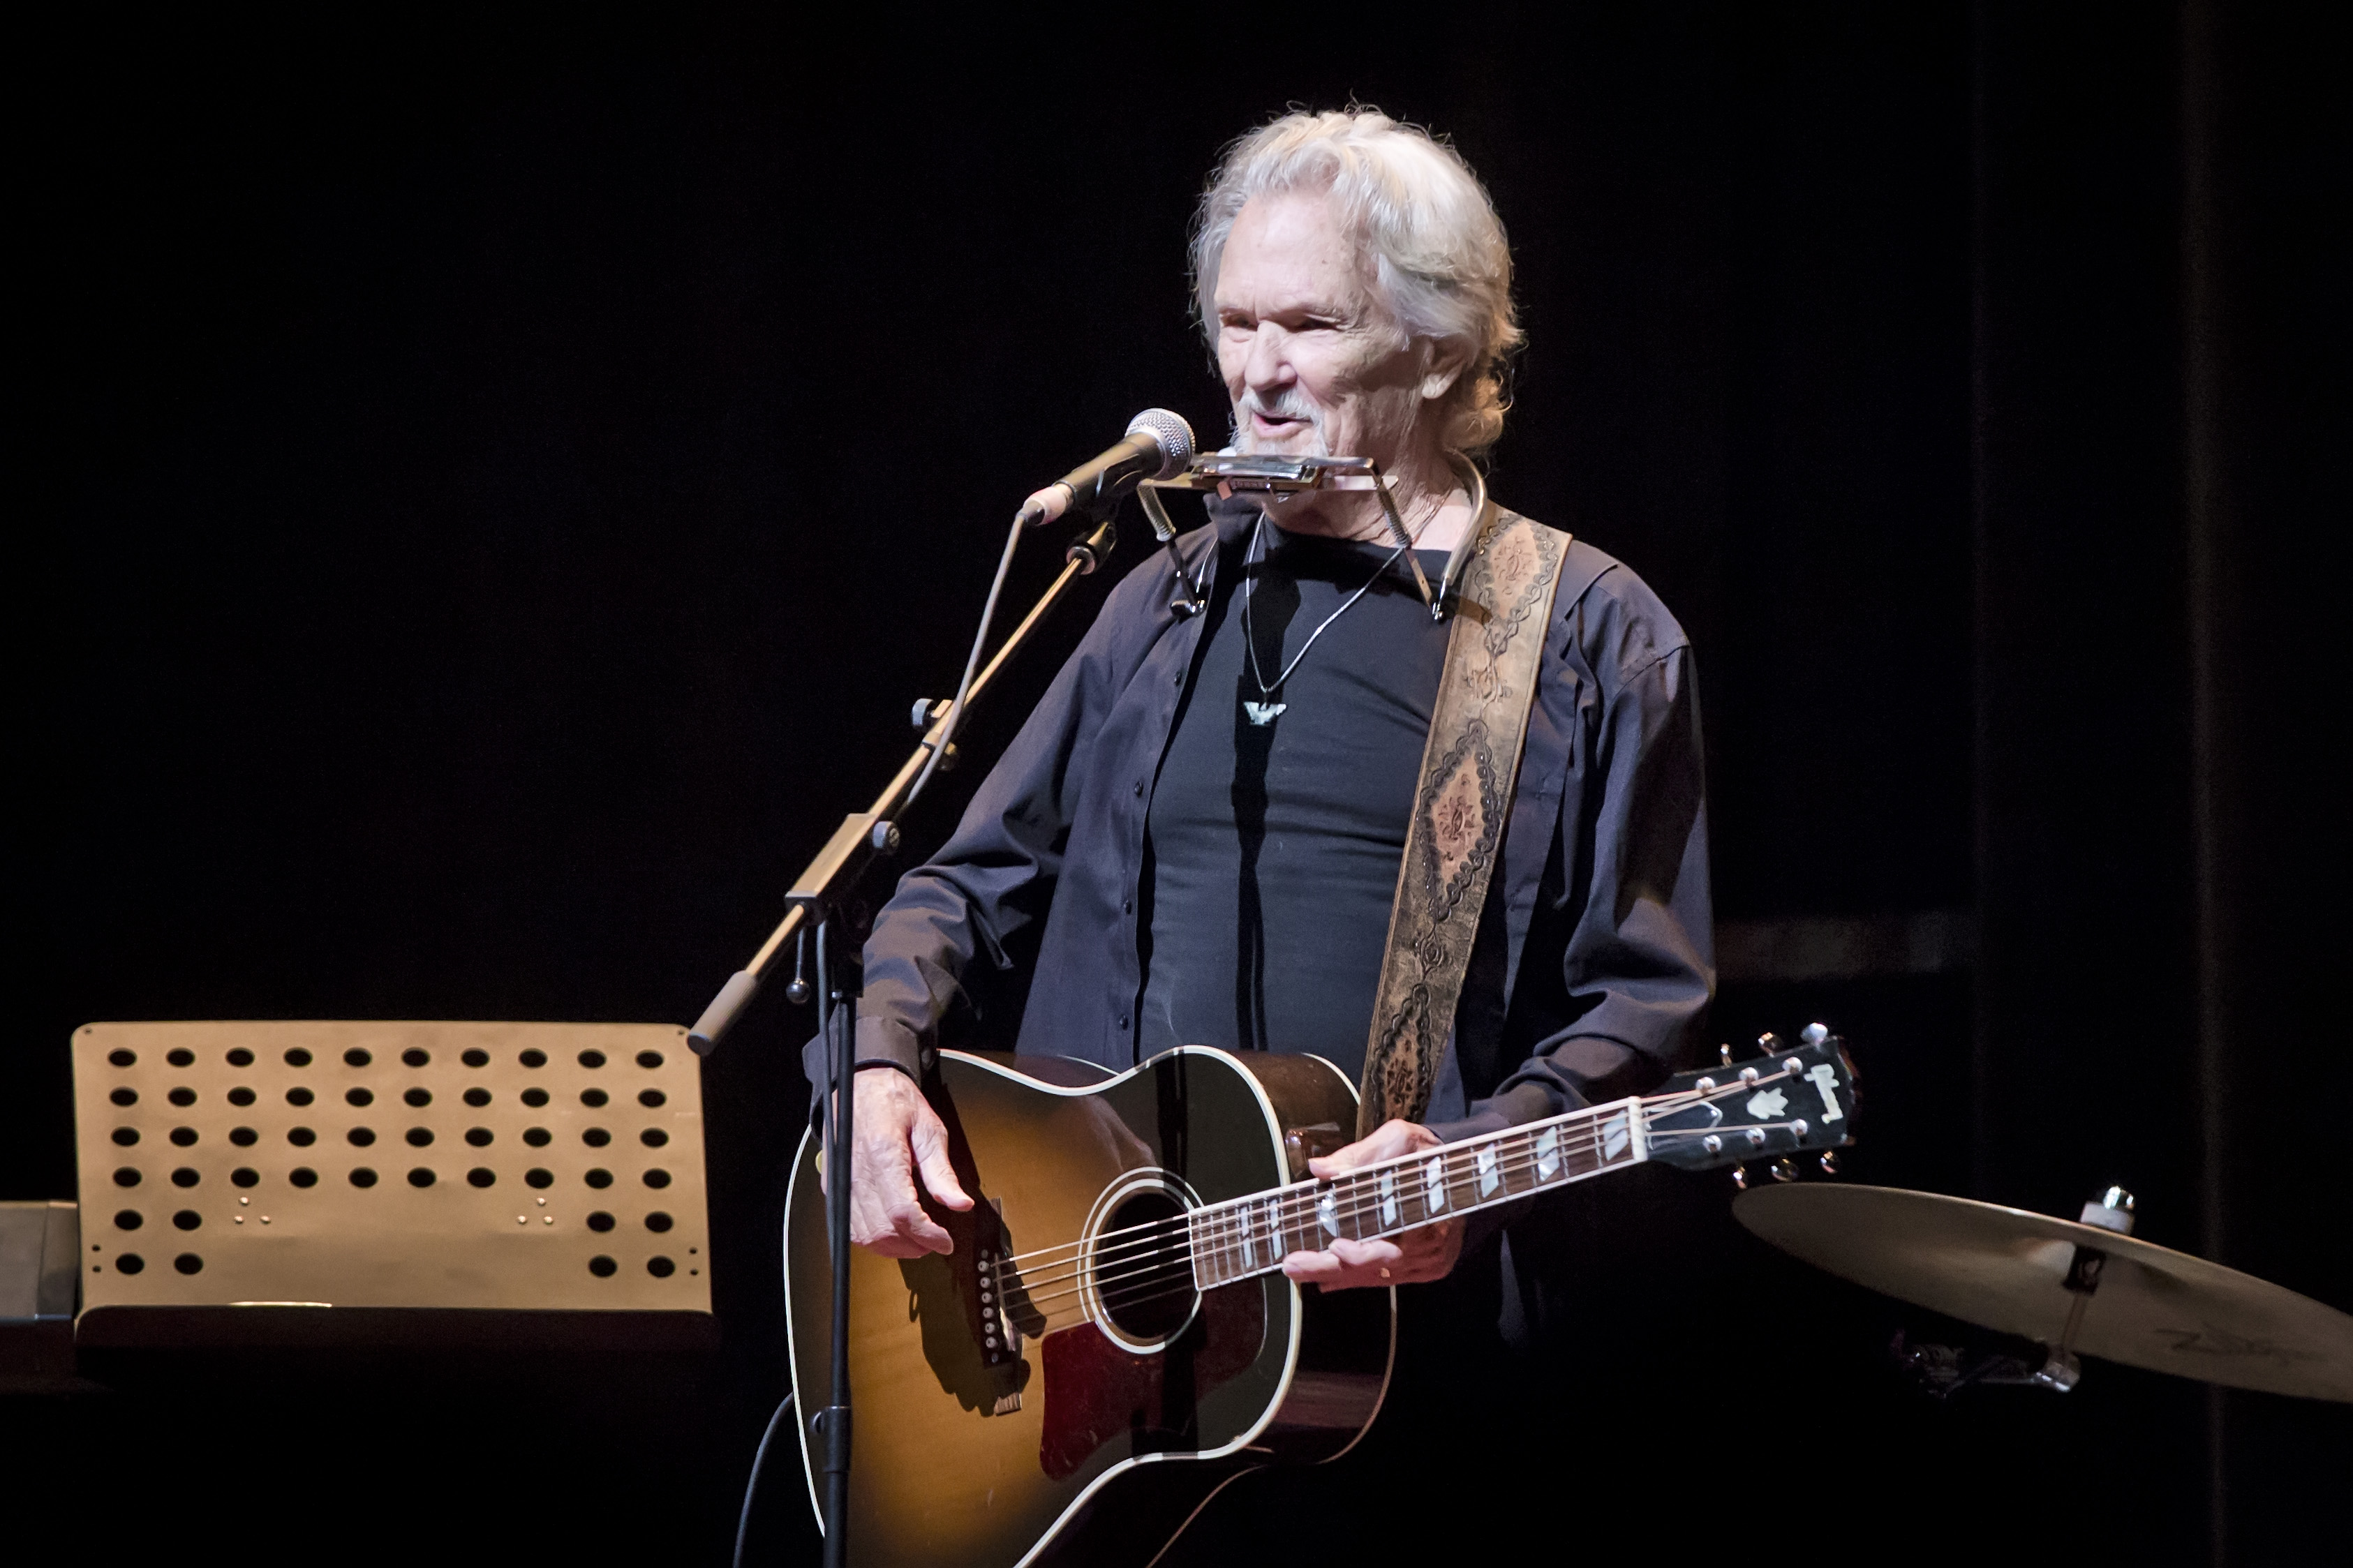 Kris Kristofferson performing in 2019